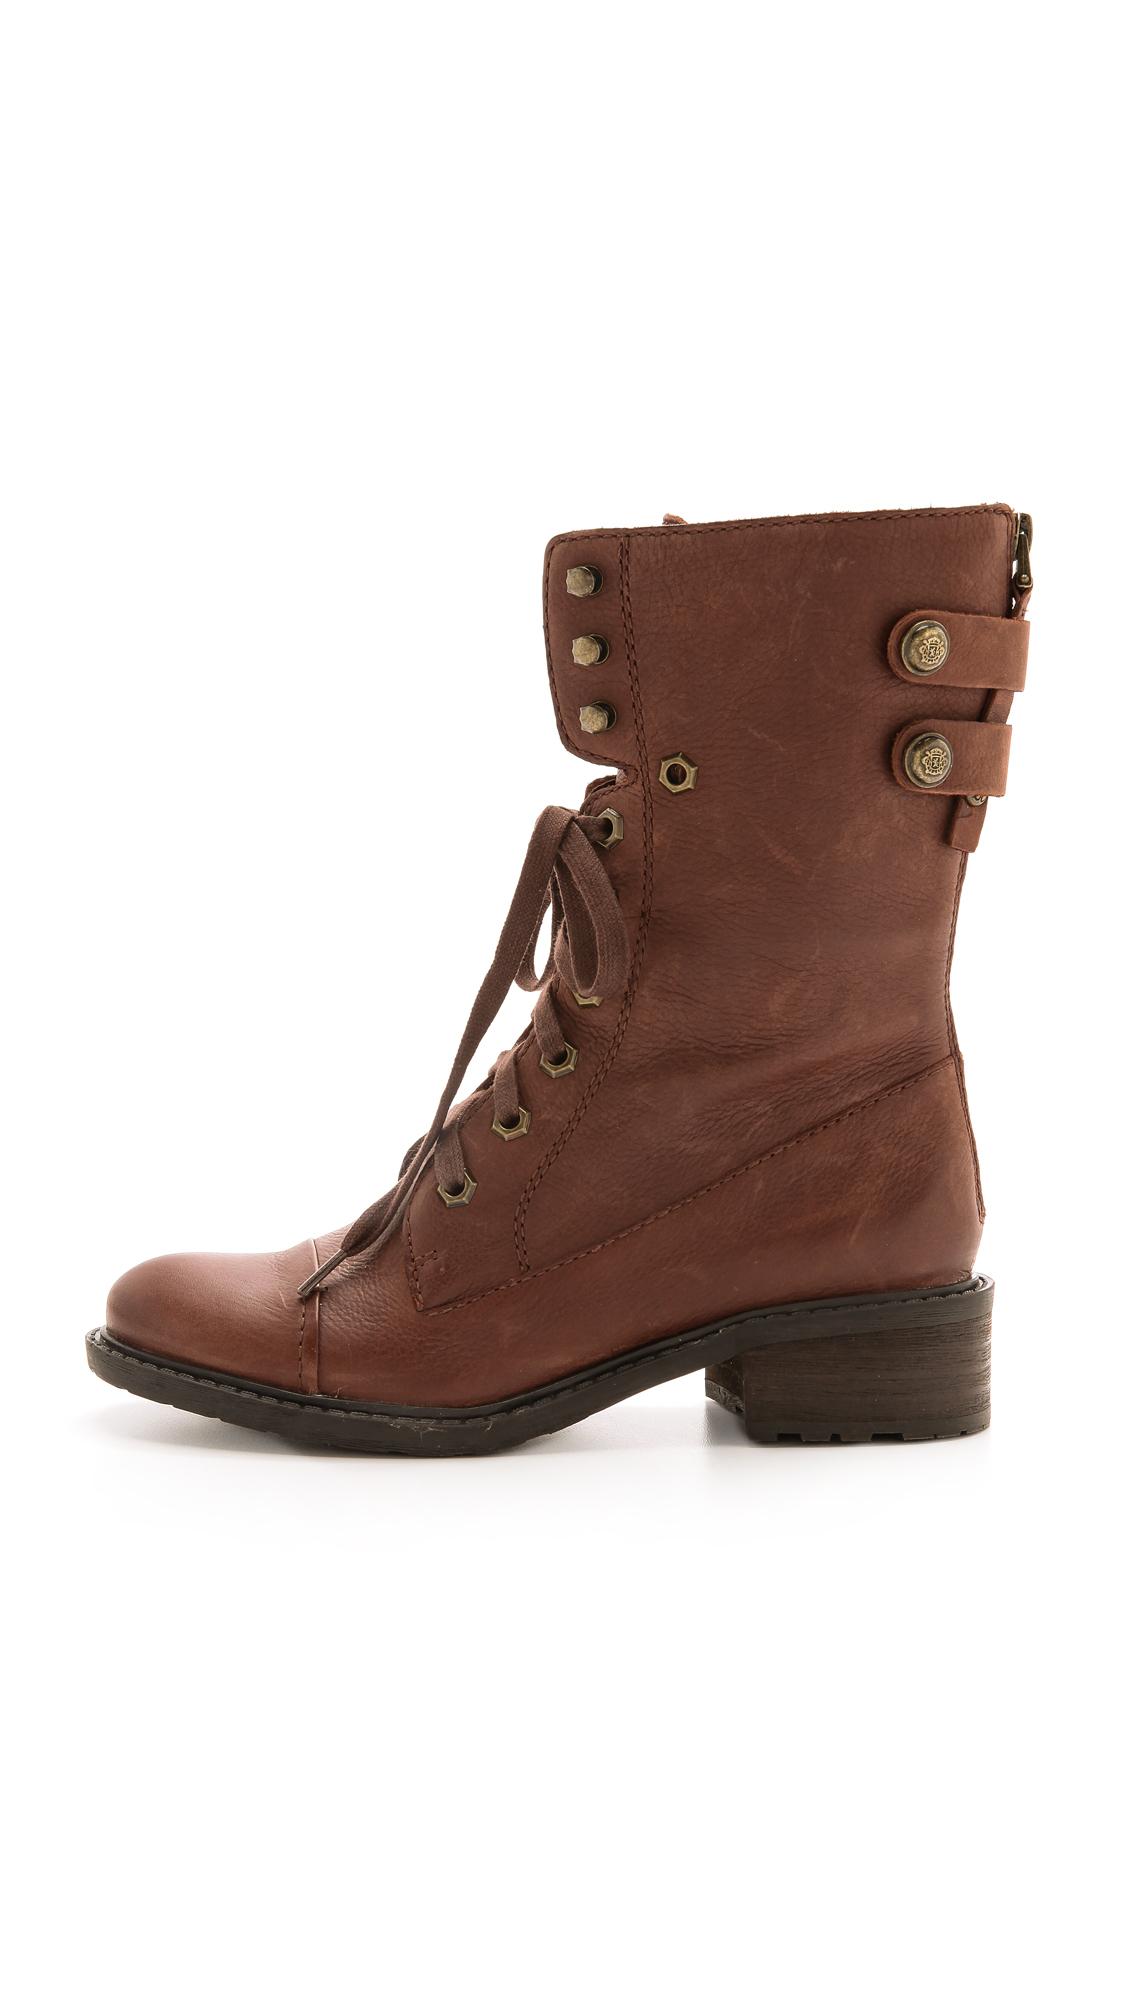 sam edelman darwin combat boots bridal brown in brown